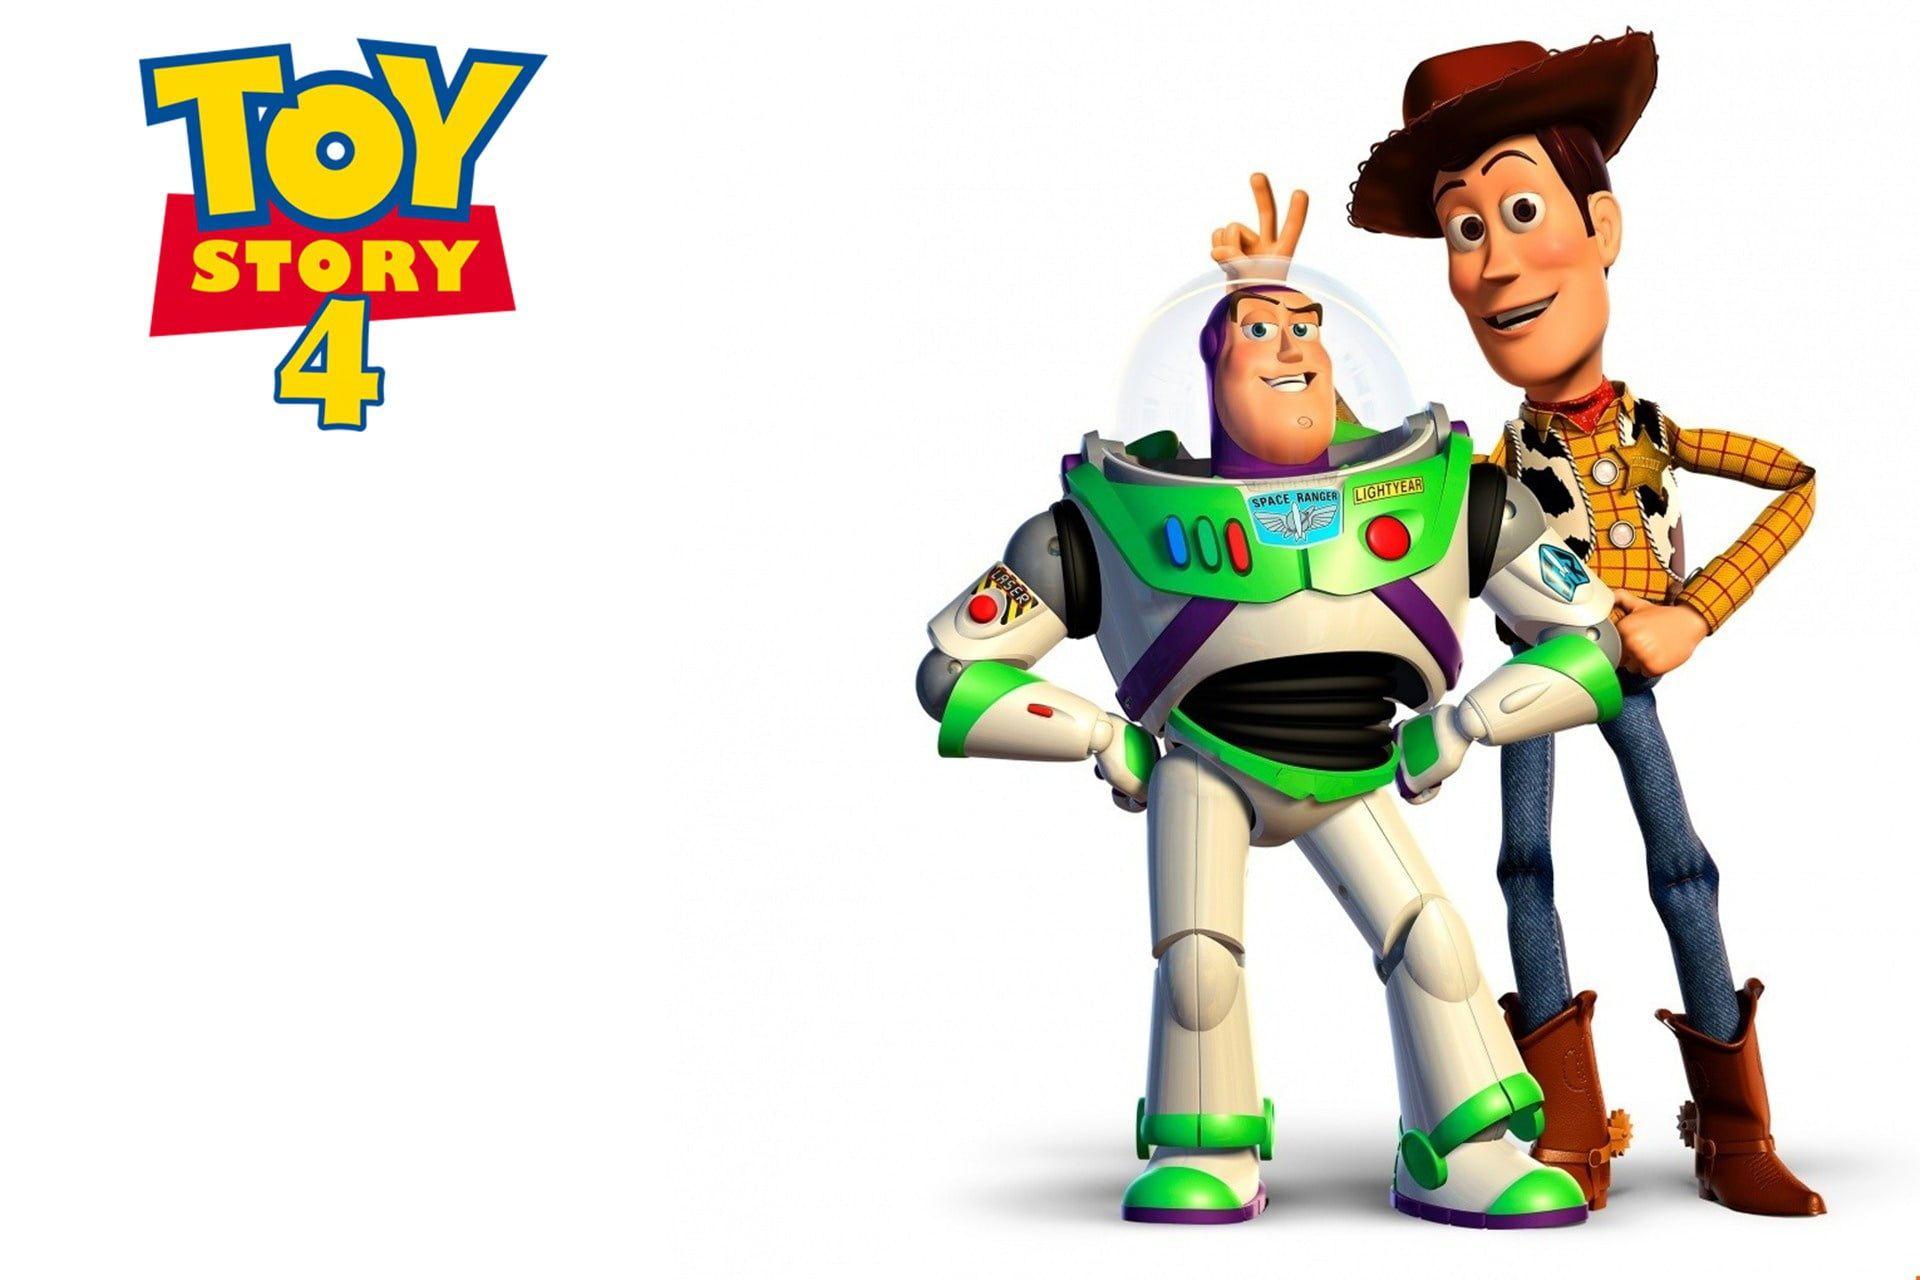 Animation Movie Toys Film Friends White Background Toy Story Simple Background Joke Woody Buzz Lightyear Toy Story Movie Toy Story Background Wasp Movie